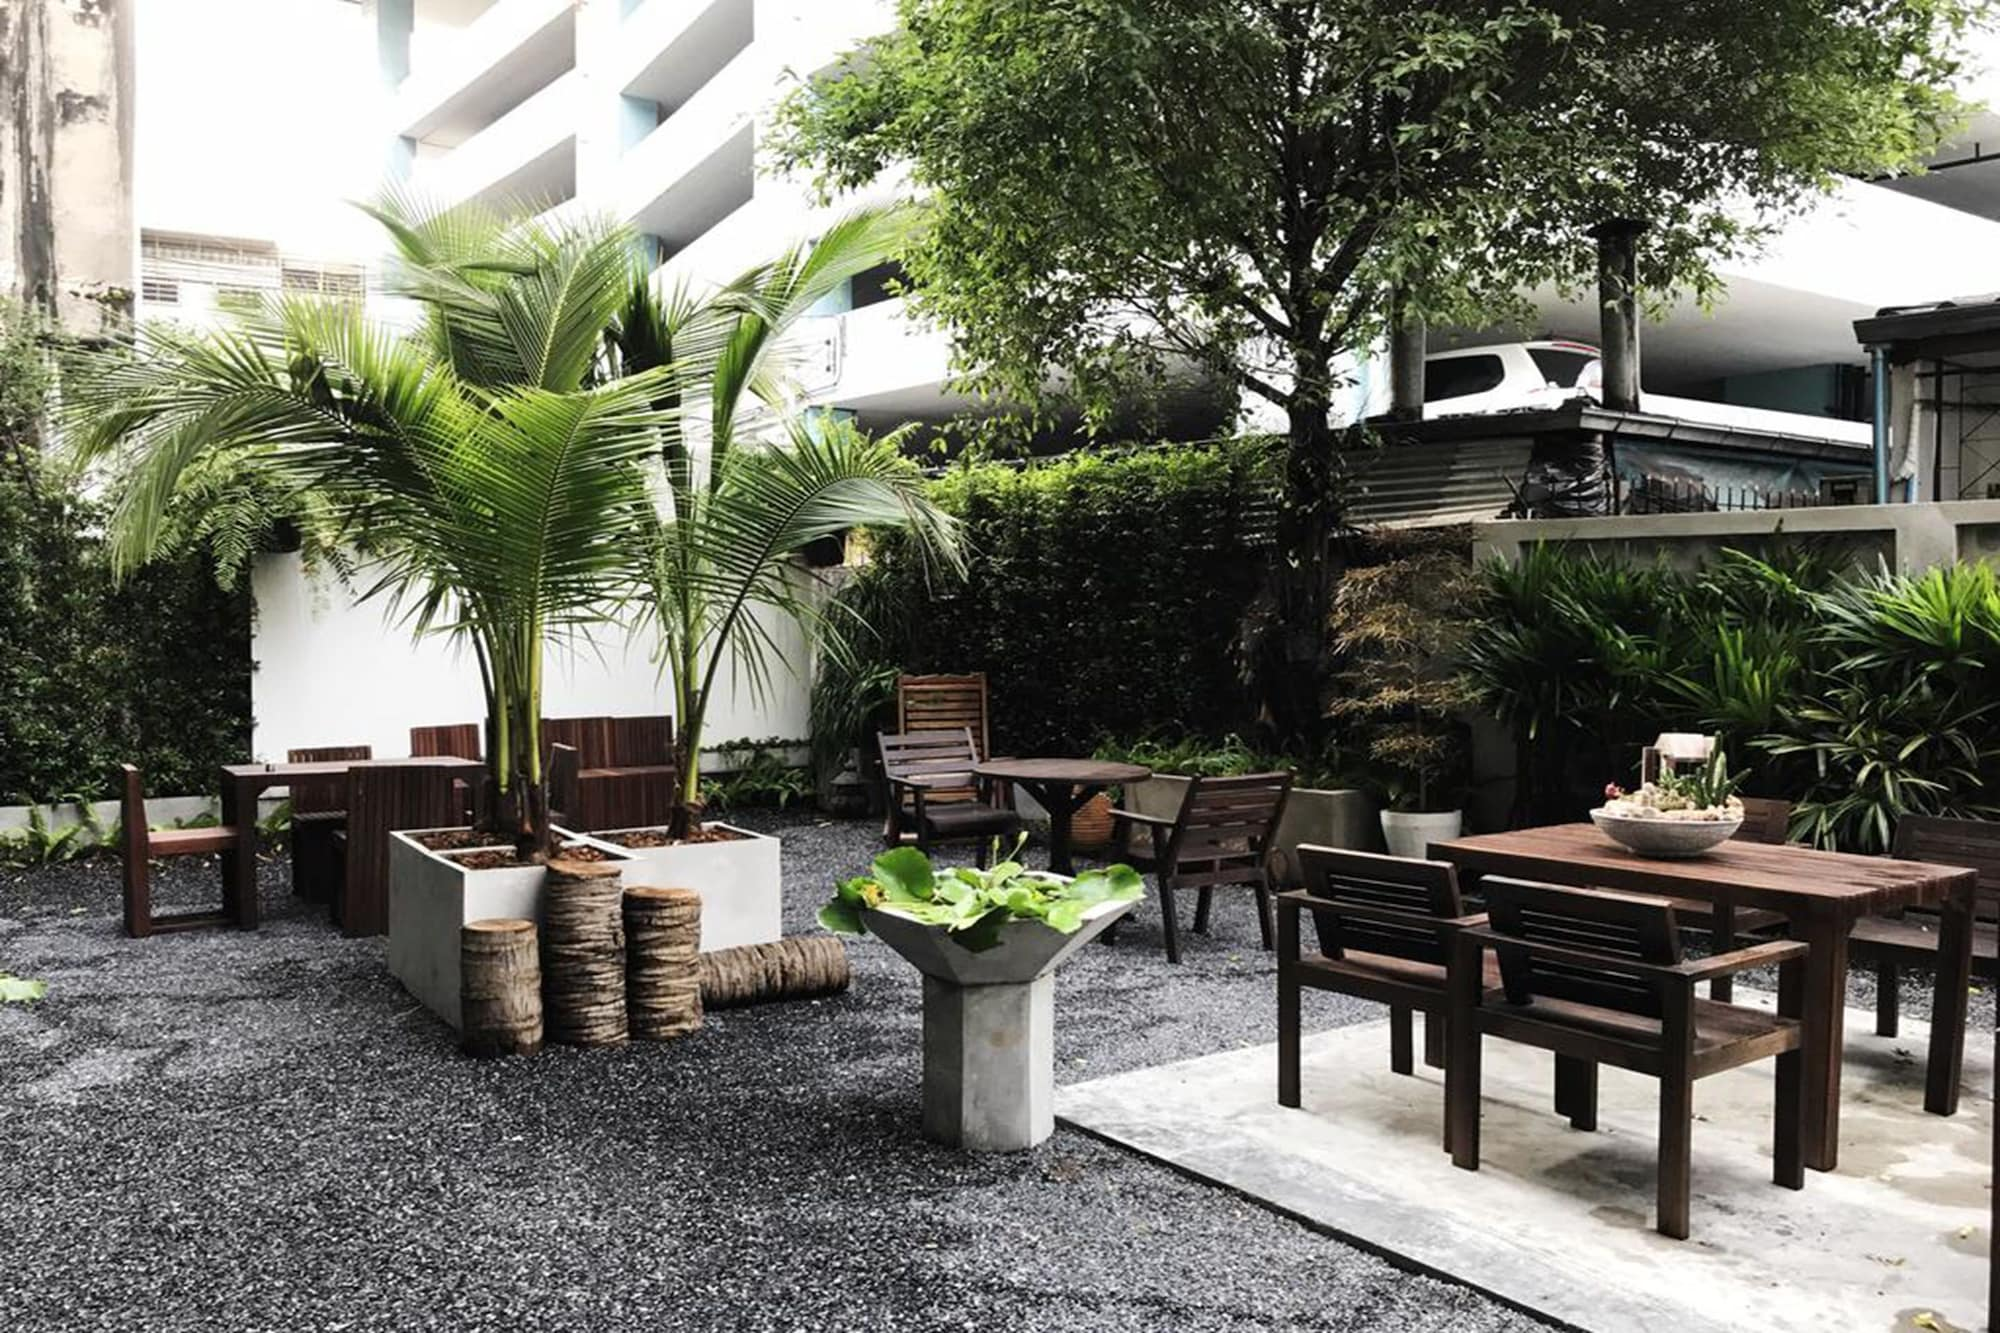 Yim Yam Hostel & Garden, Ratchathewi